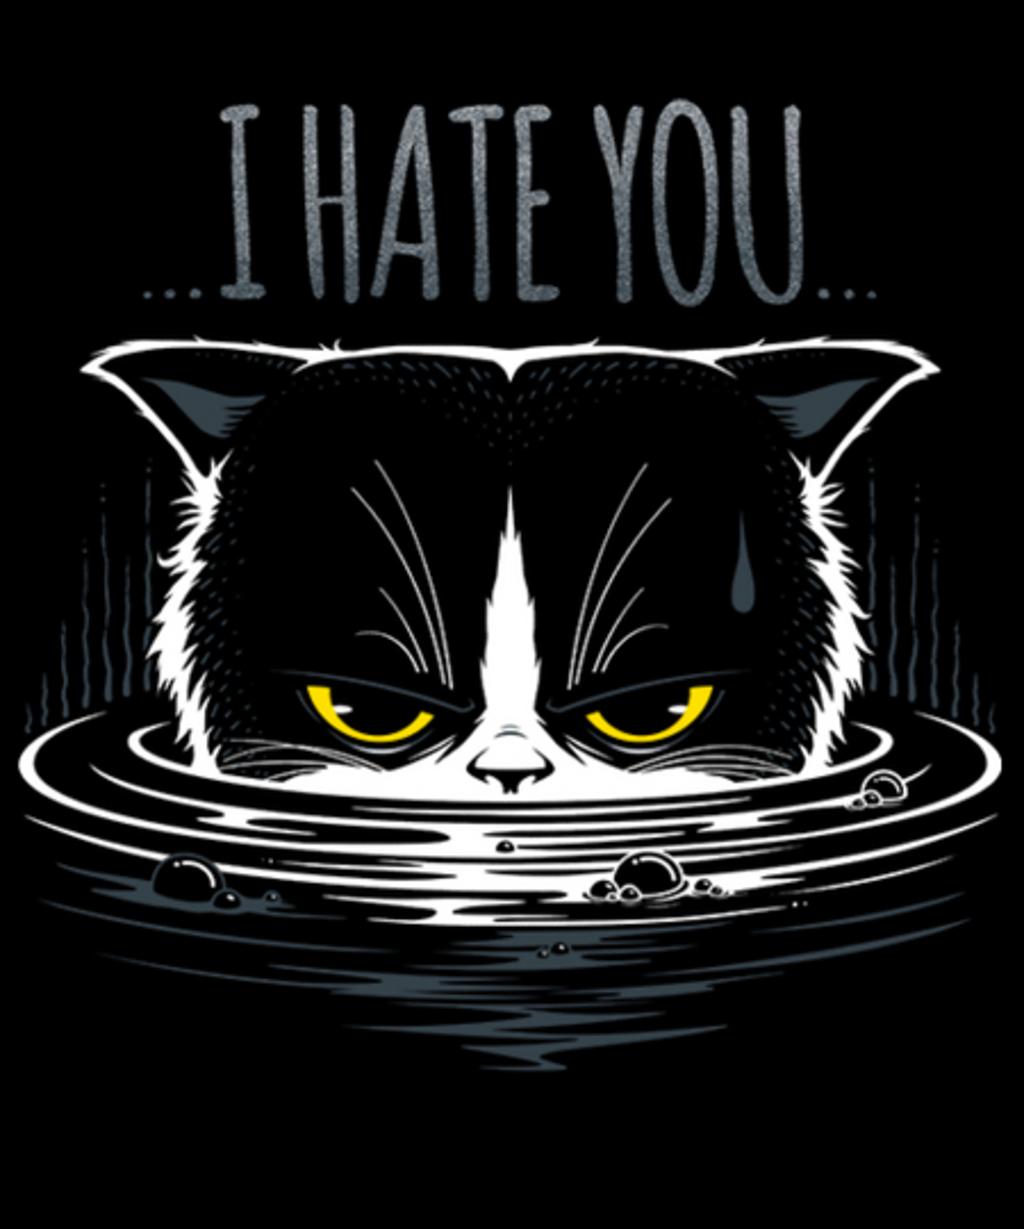 Qwertee: I HATE YOU